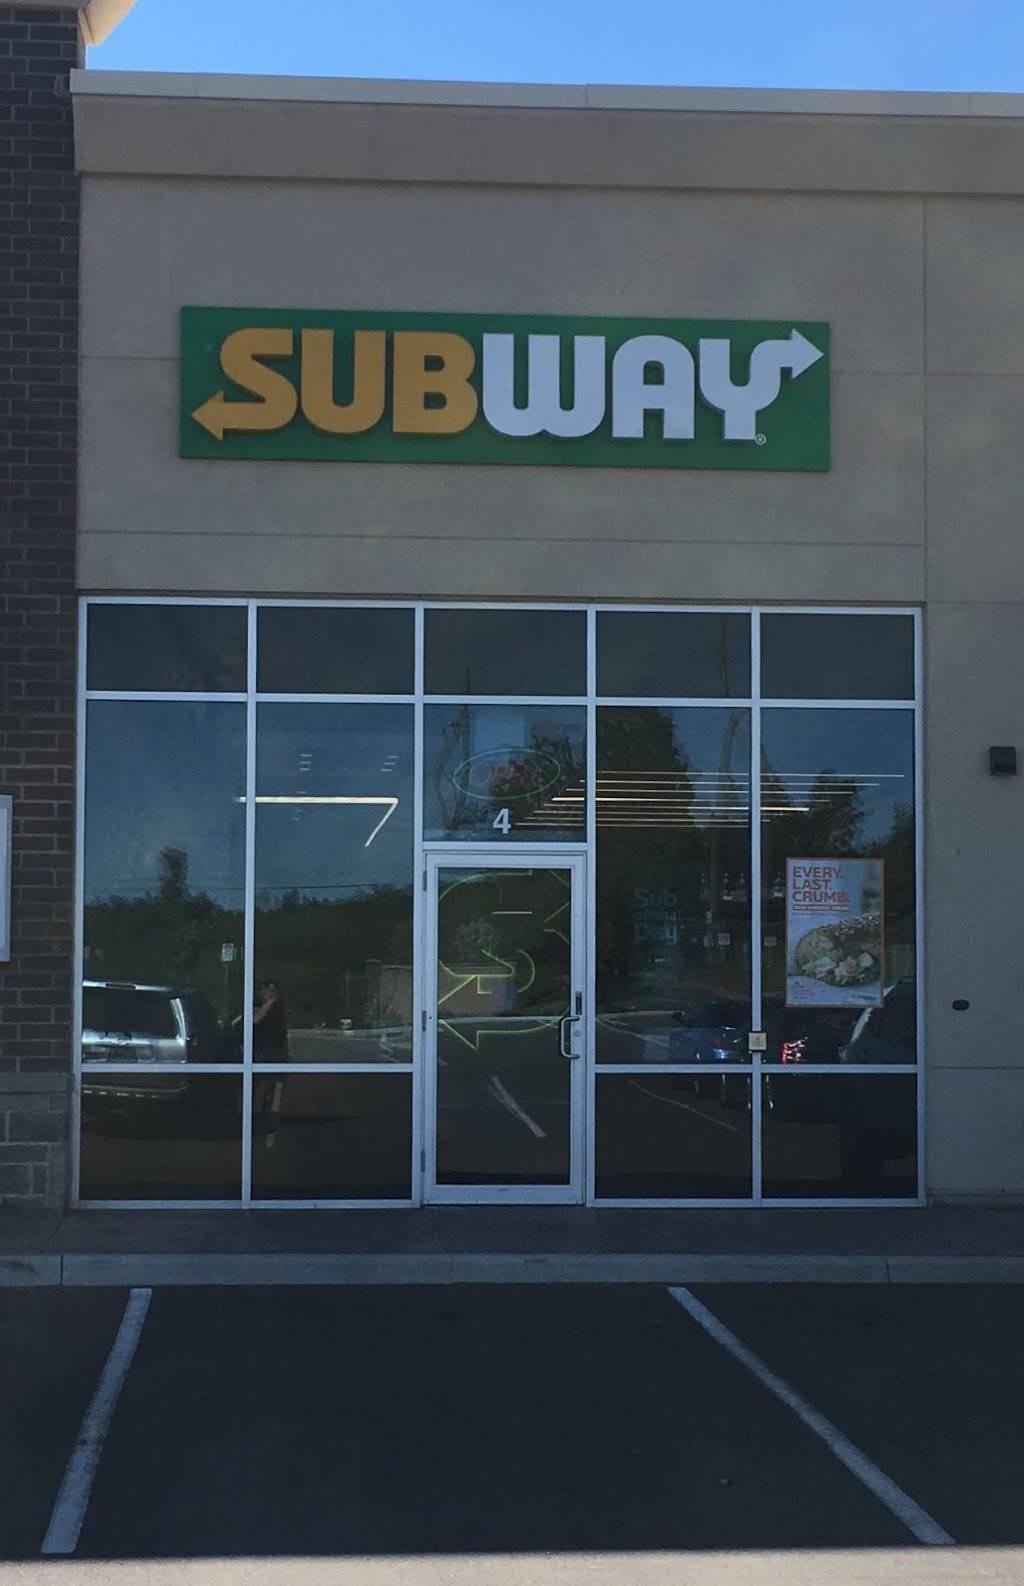 Subway | restaurant | Oakwoods Centre, 1903 Ironoak Way Unit 4, Oakville, ON L6H 0N1, Canada | 9058424888 OR +1 905-842-4888